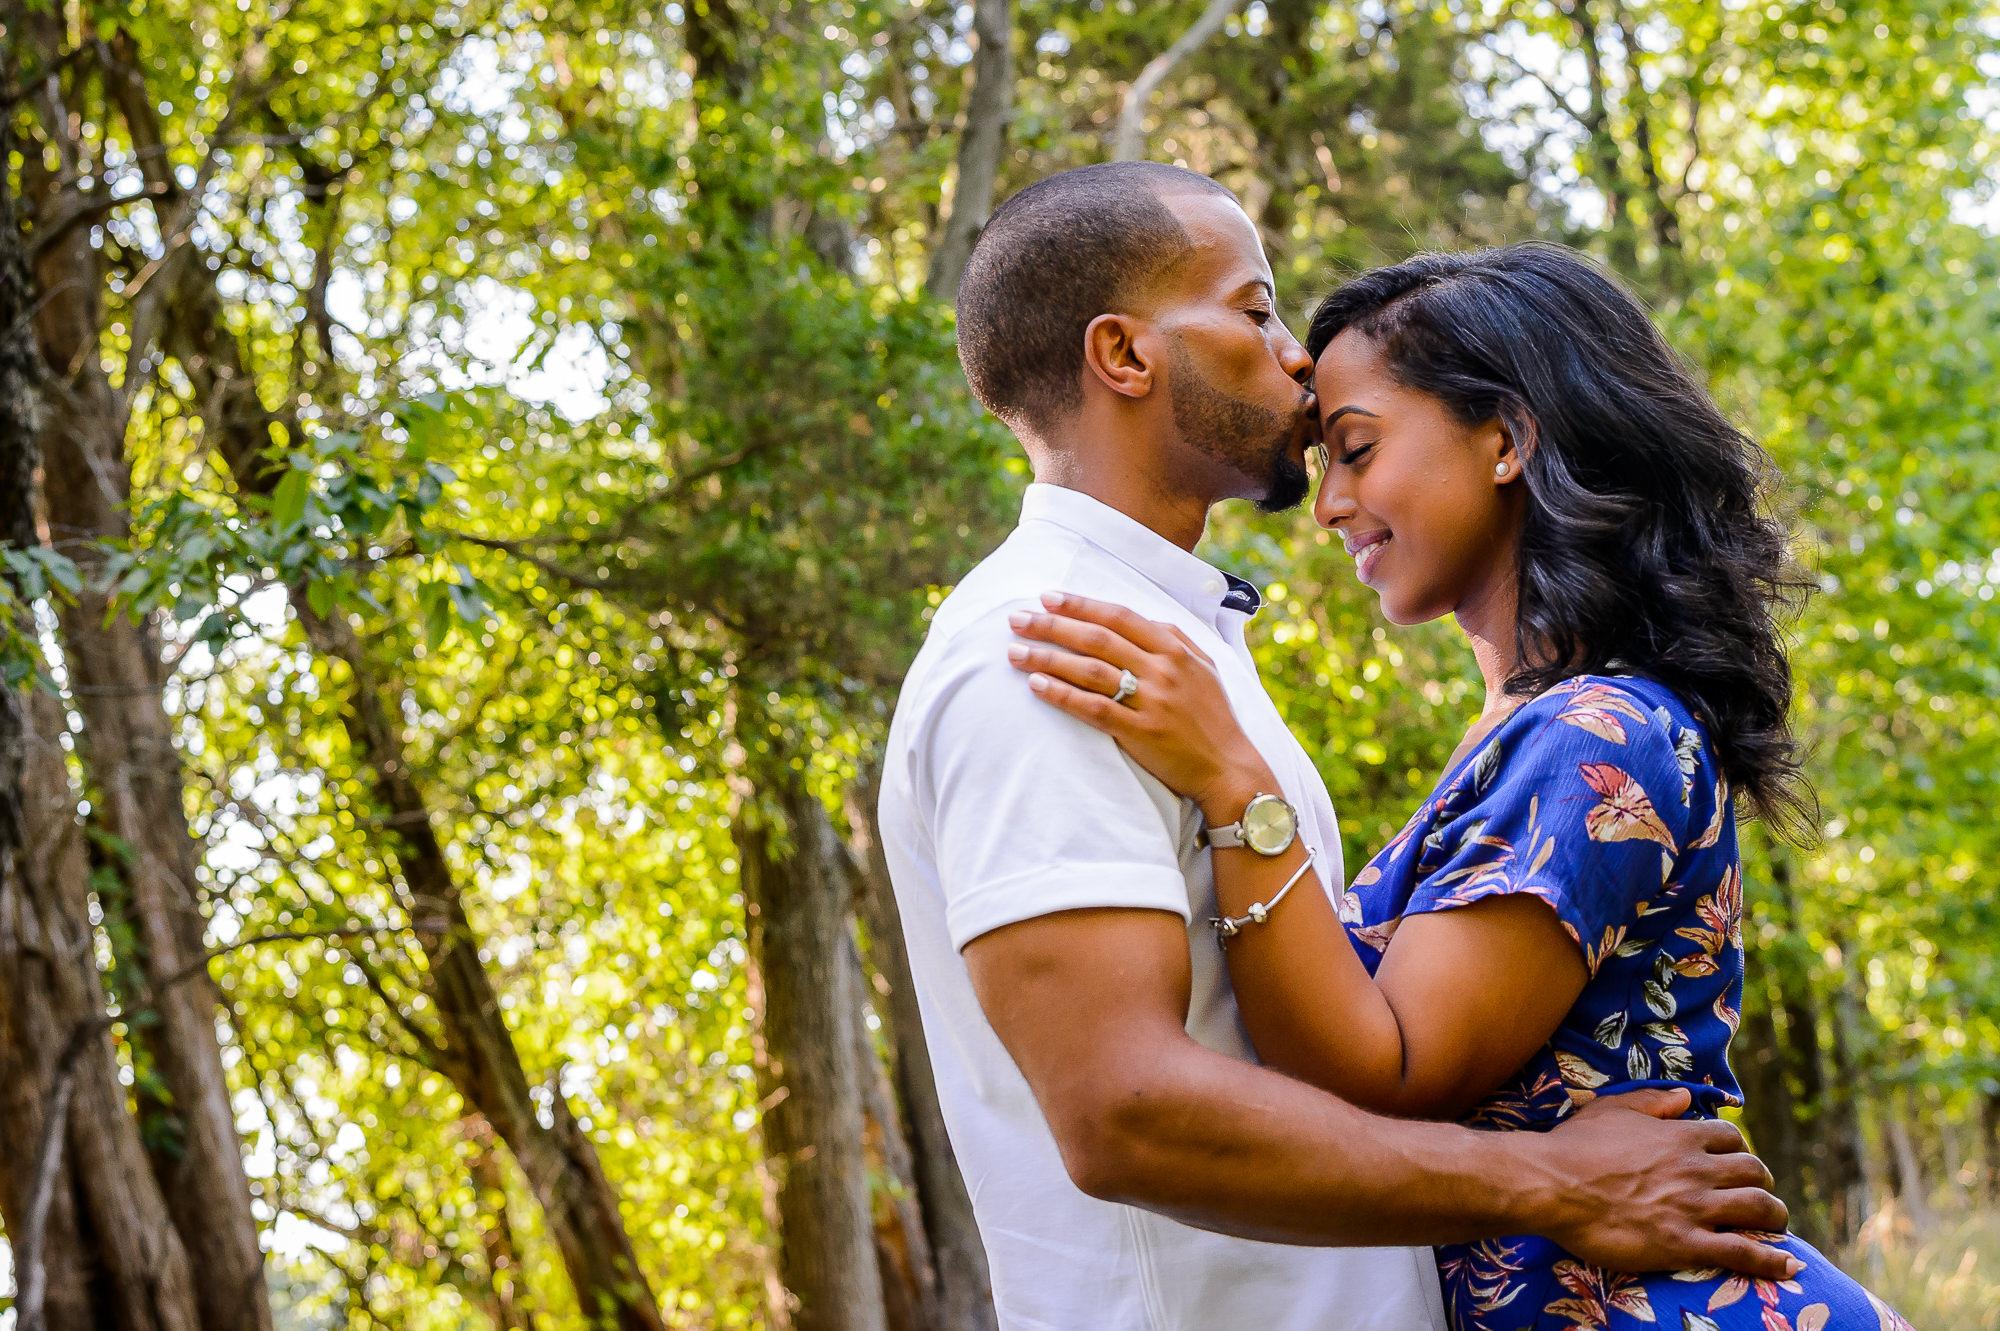 021-christopher-jason-studios-washington-dc-national-gallery-of -art-engagement-session-ethiopian-eritrean-couple-embraces-in-trees.jpg